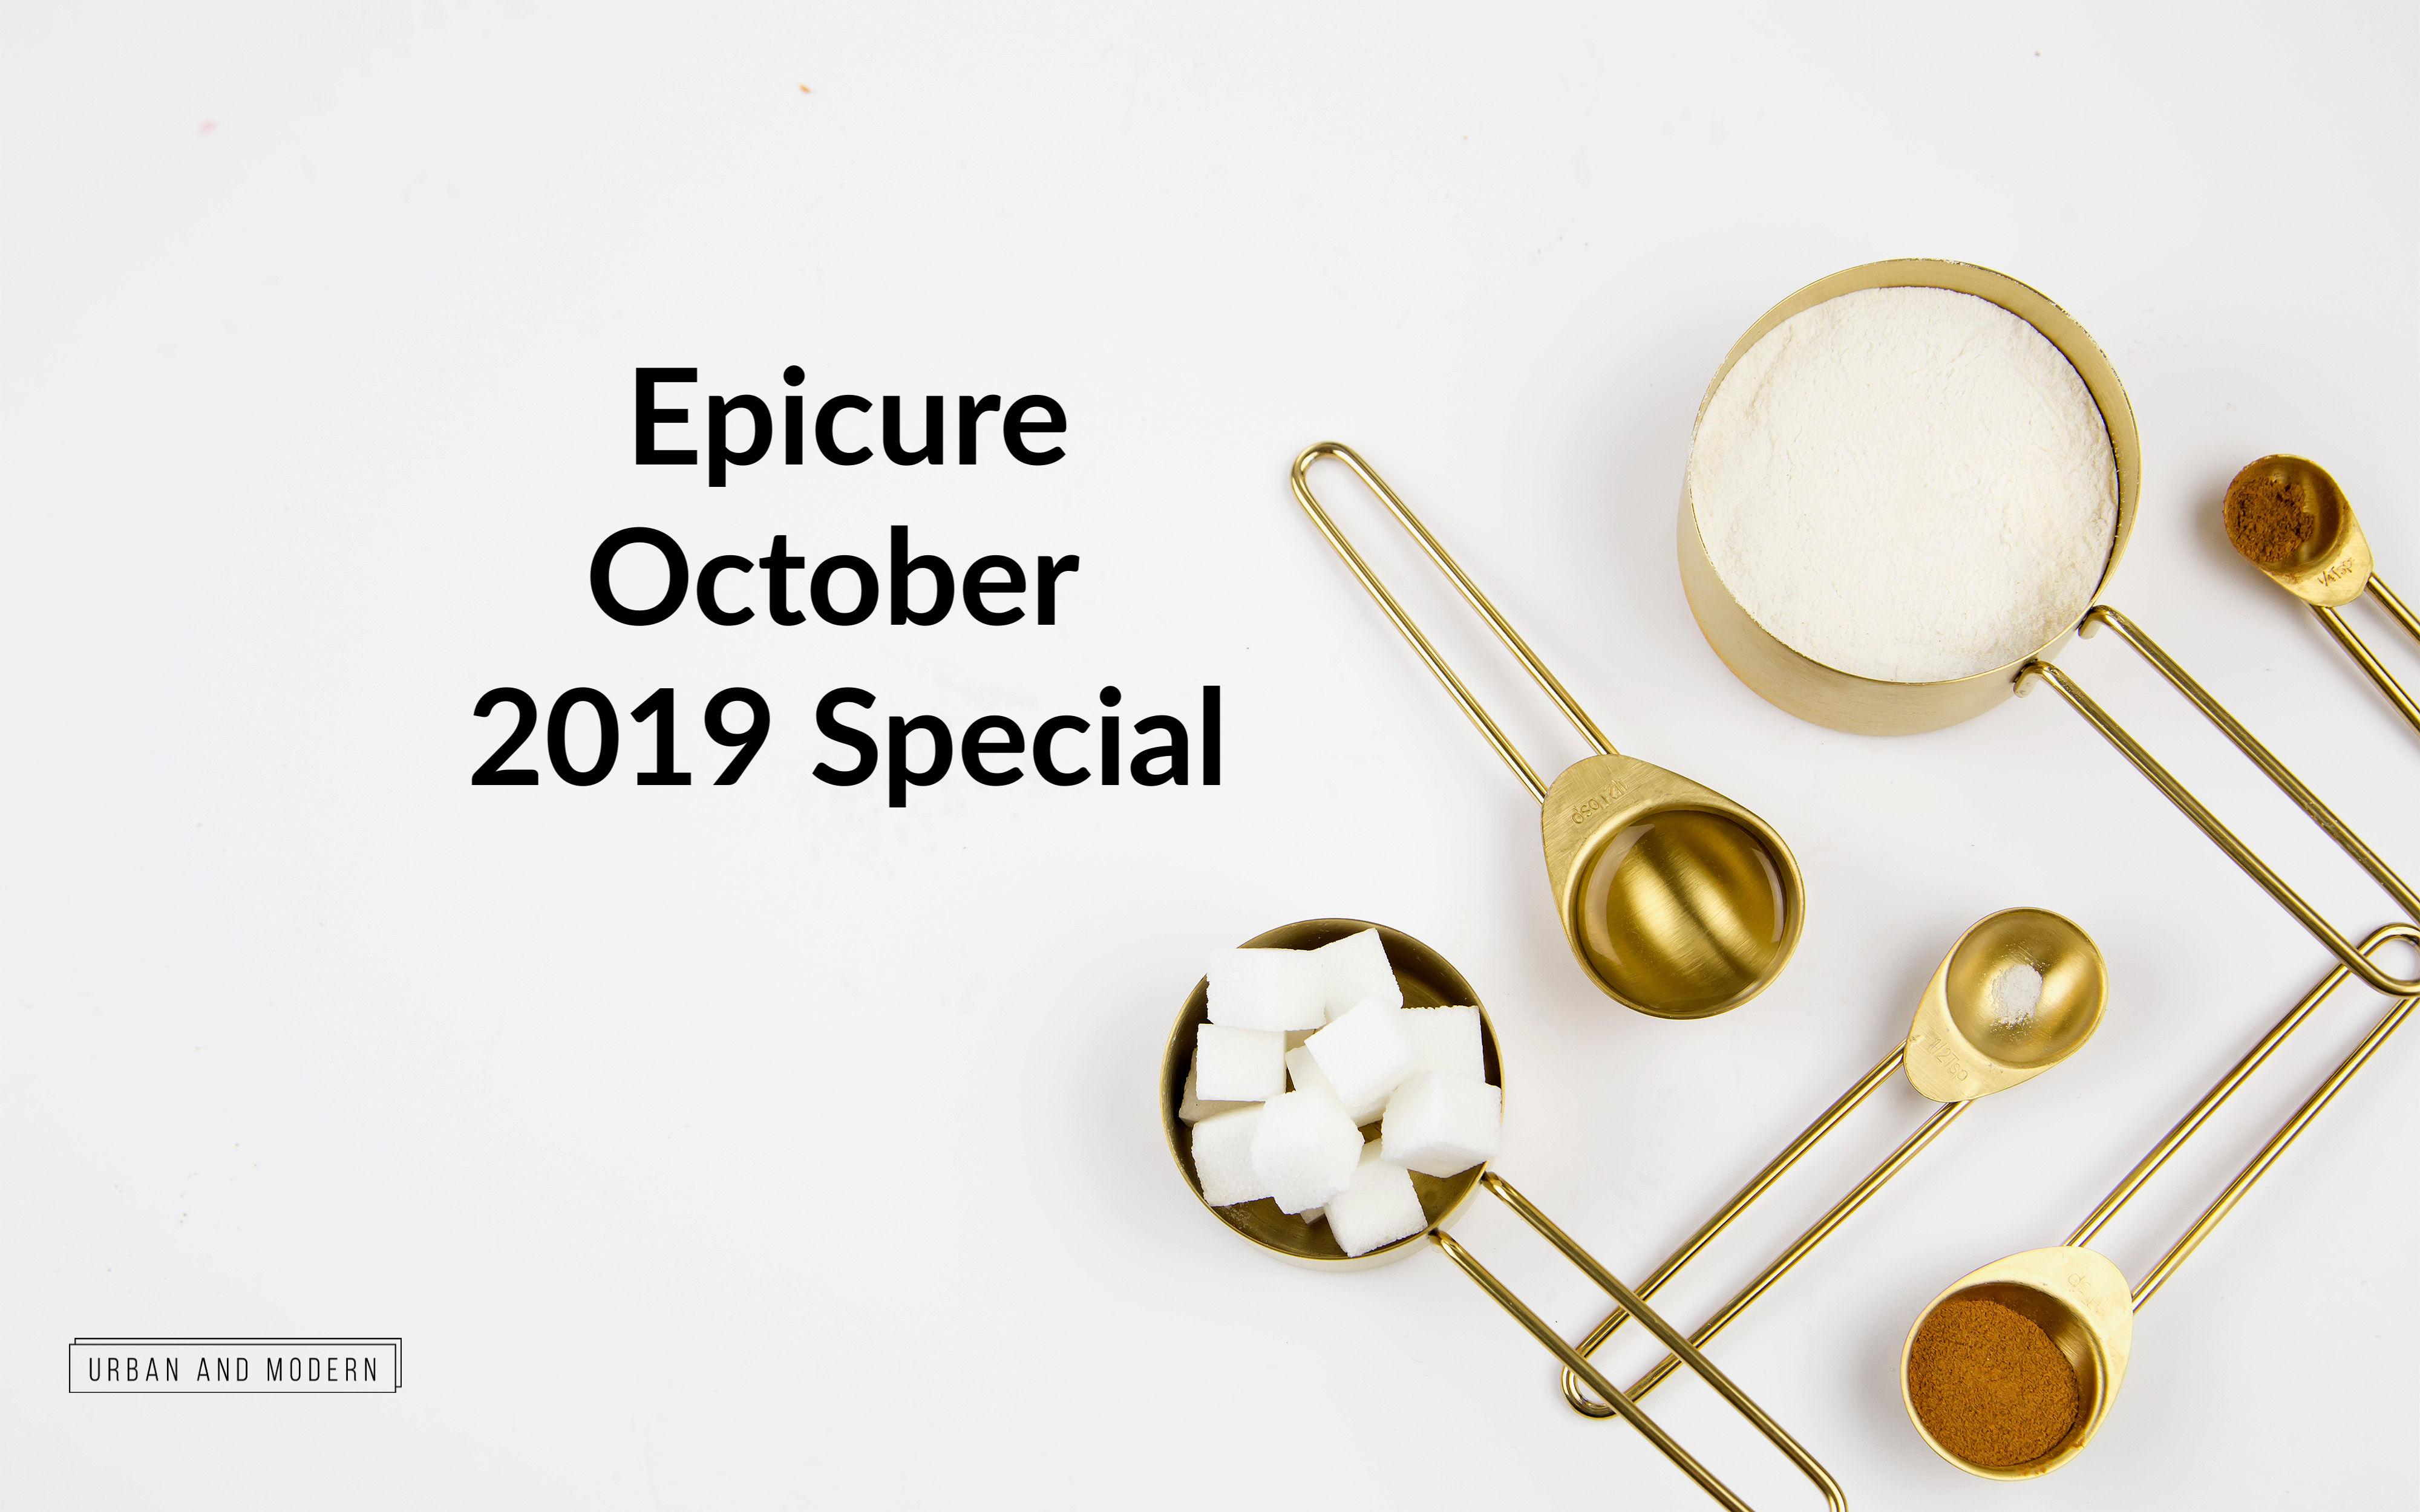 Epicure October 2019 special